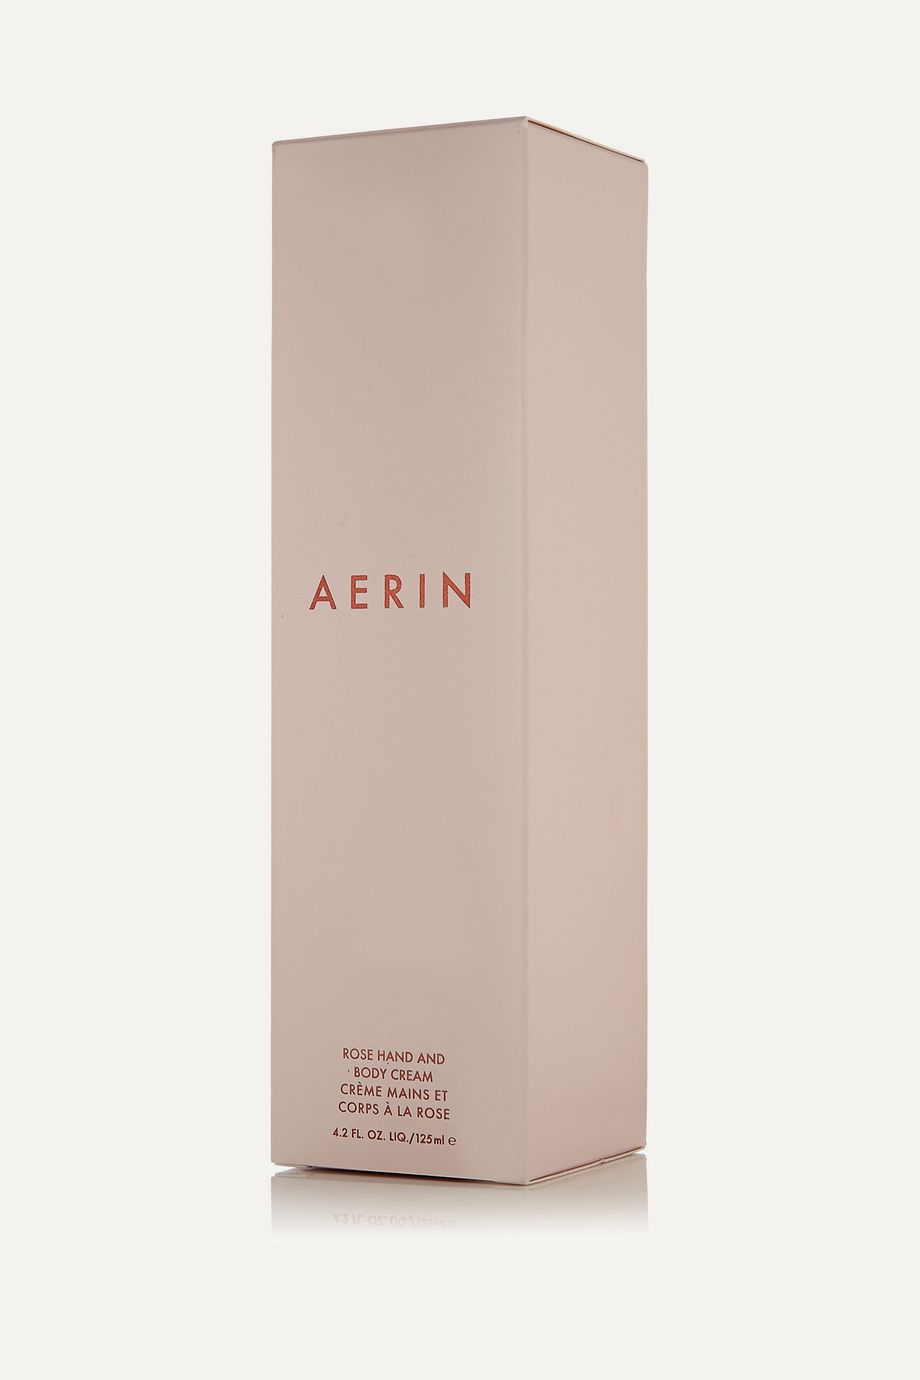 AERIN Beauty Rose Hand and Body Cream, 125 ml – Hand- und Körpercreme